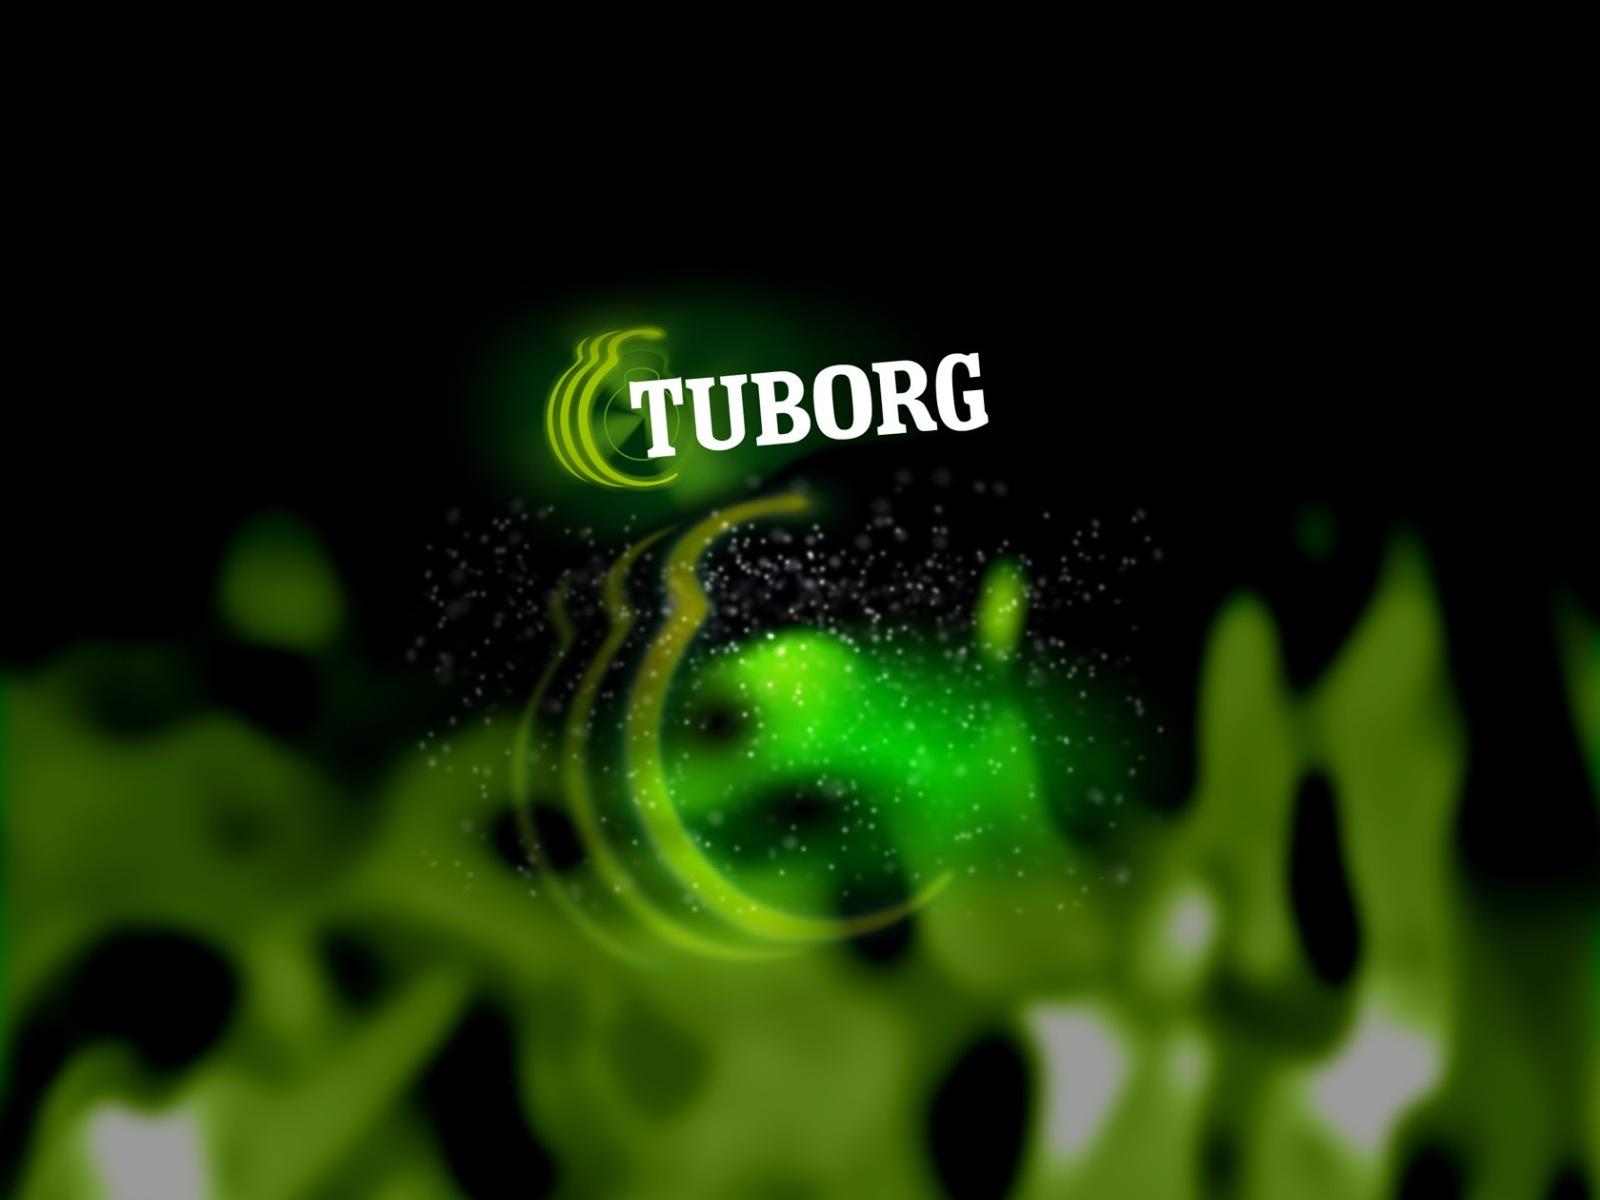 Обои Tuborg 36